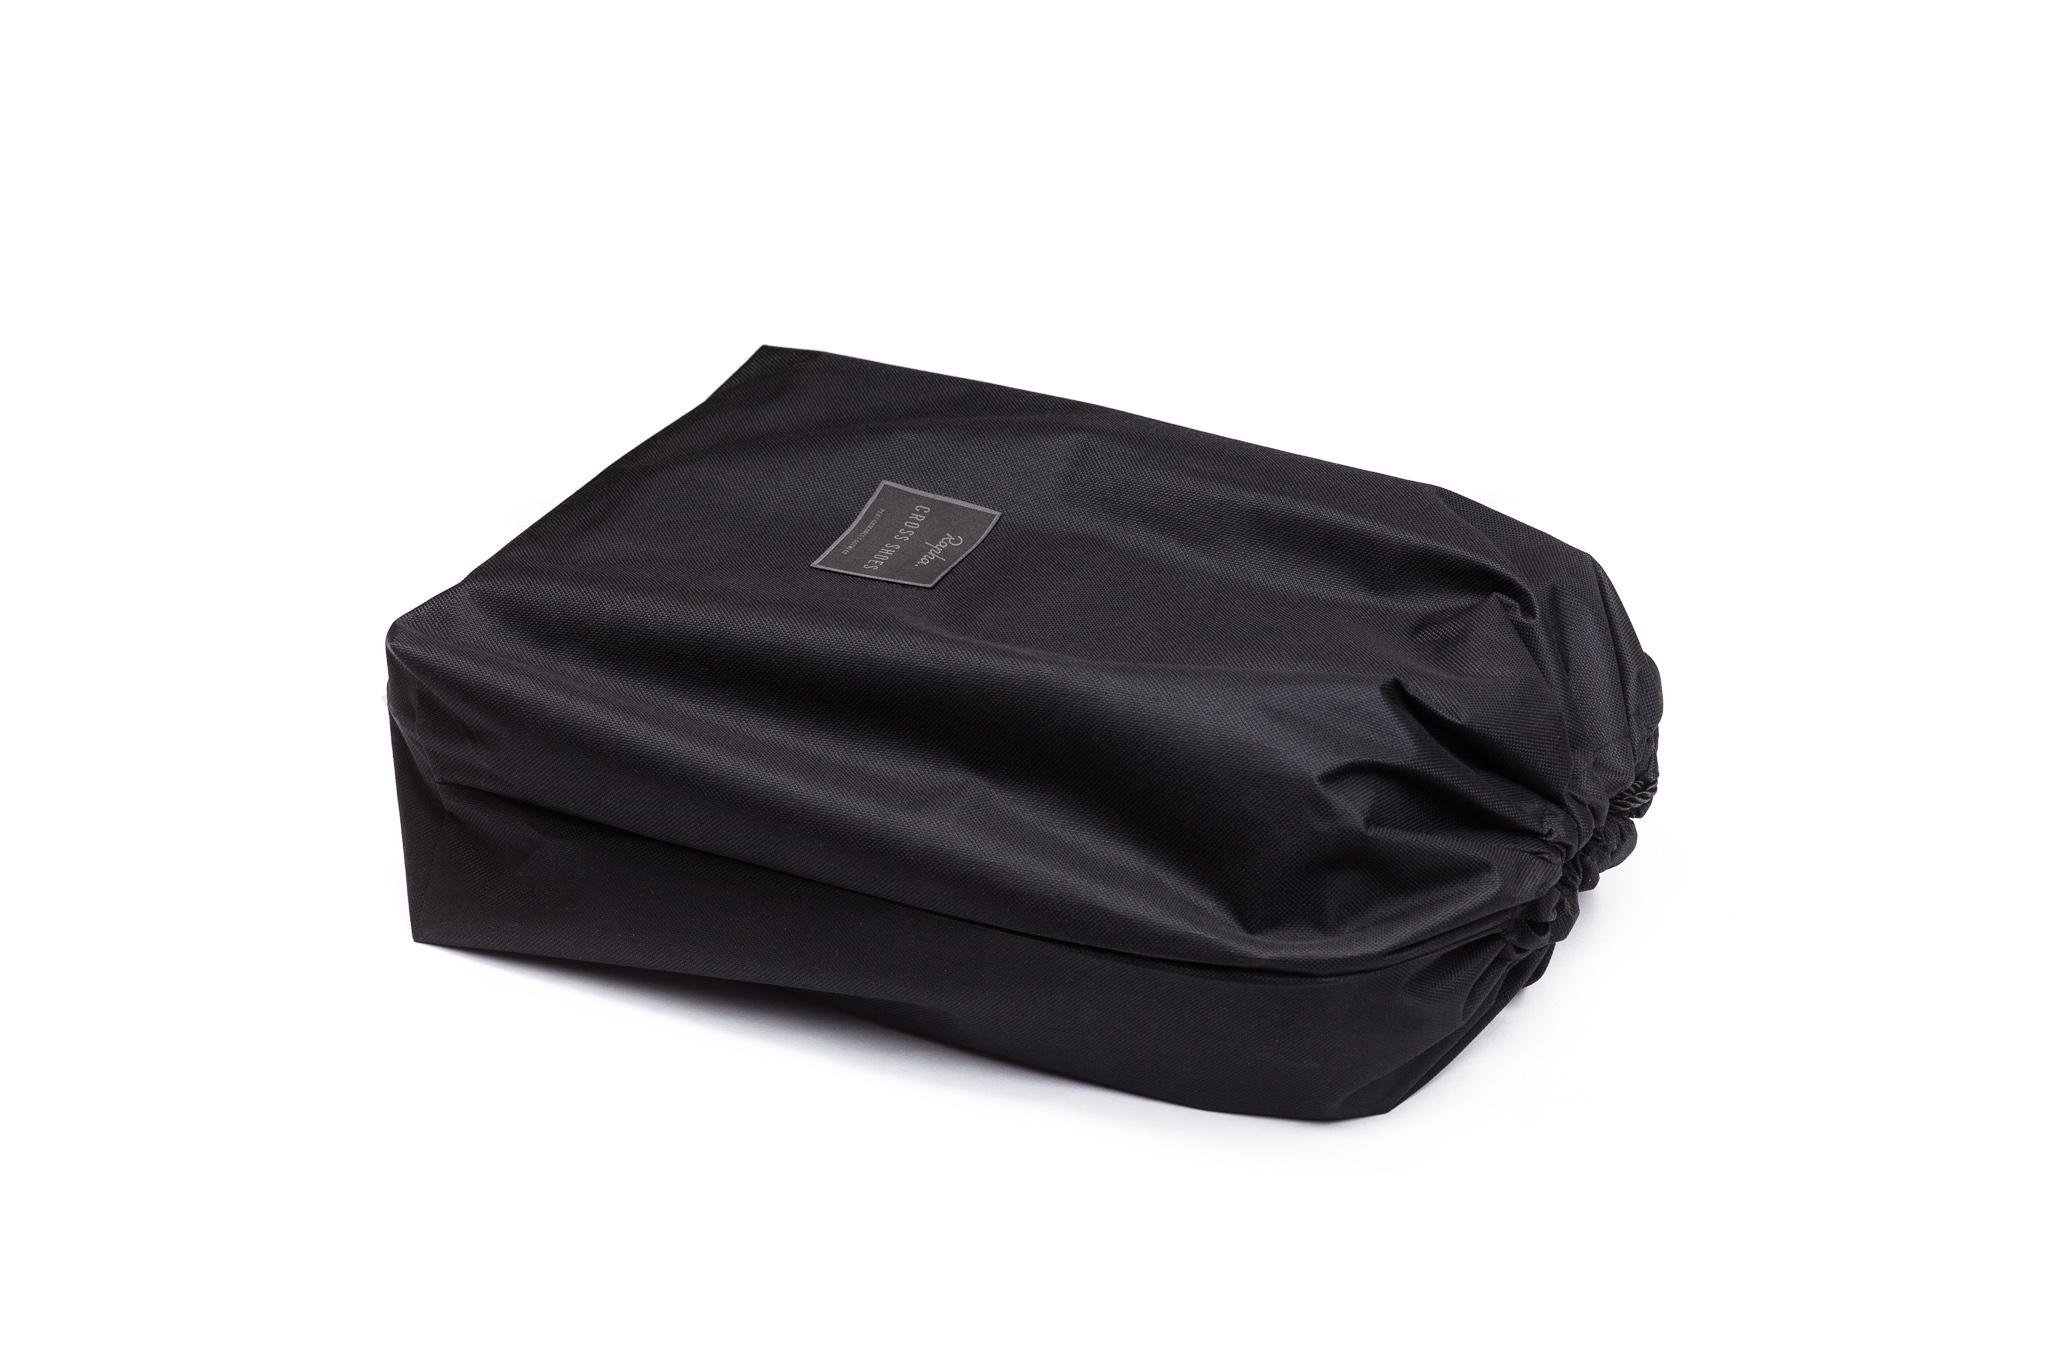 AW14-Rapha-Cross-Shoe-Packaging-4